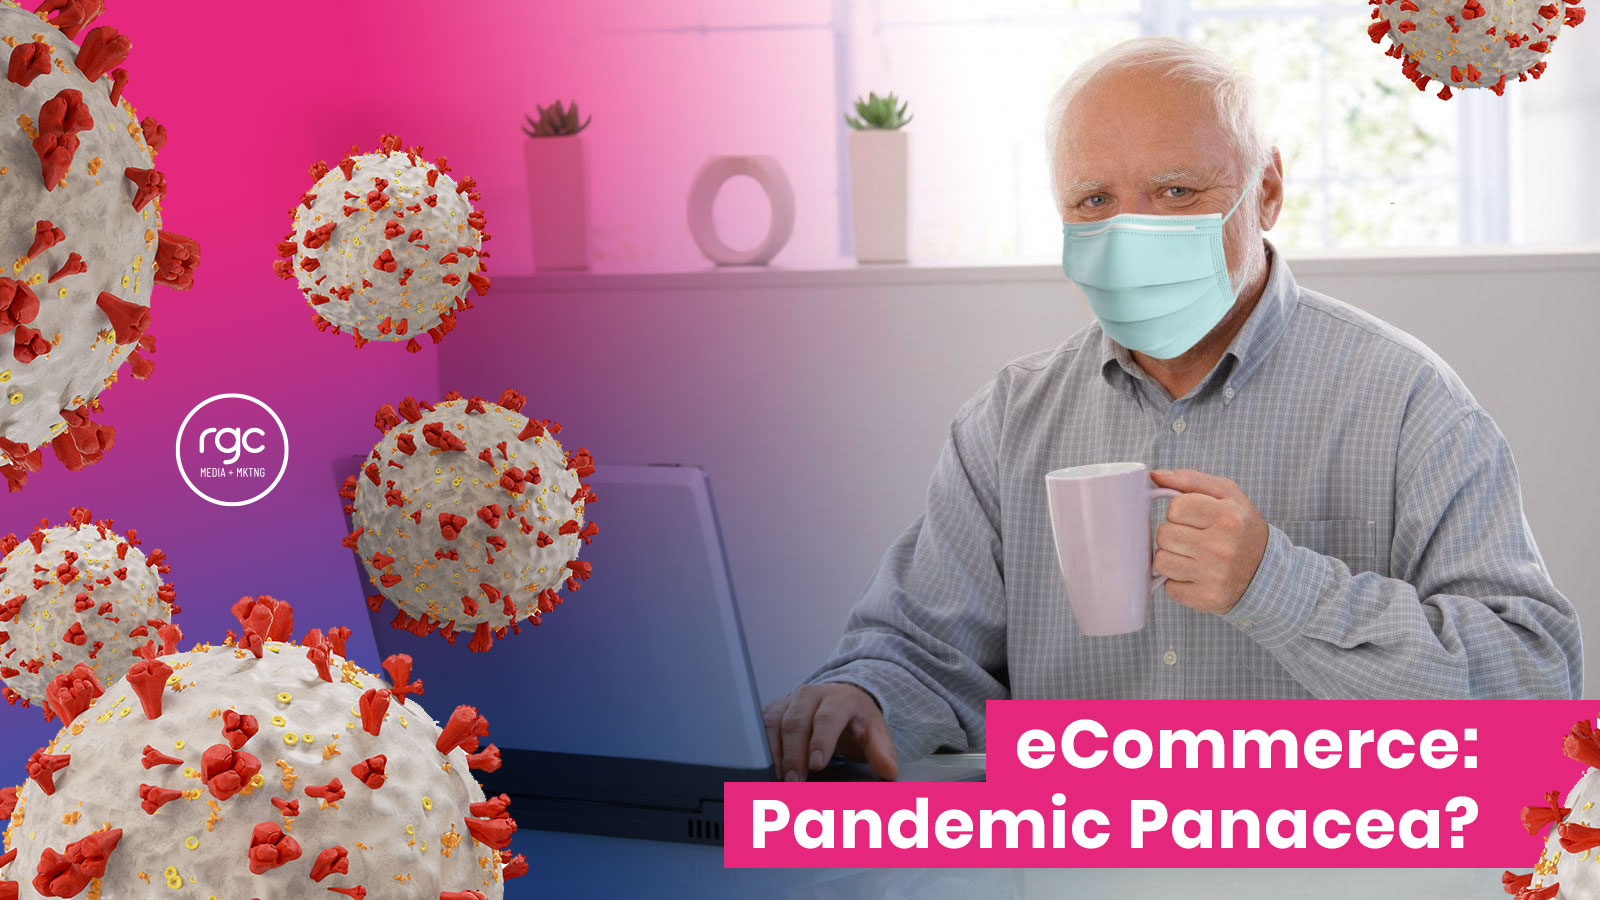 eCommerce: Pandemic Panacea?